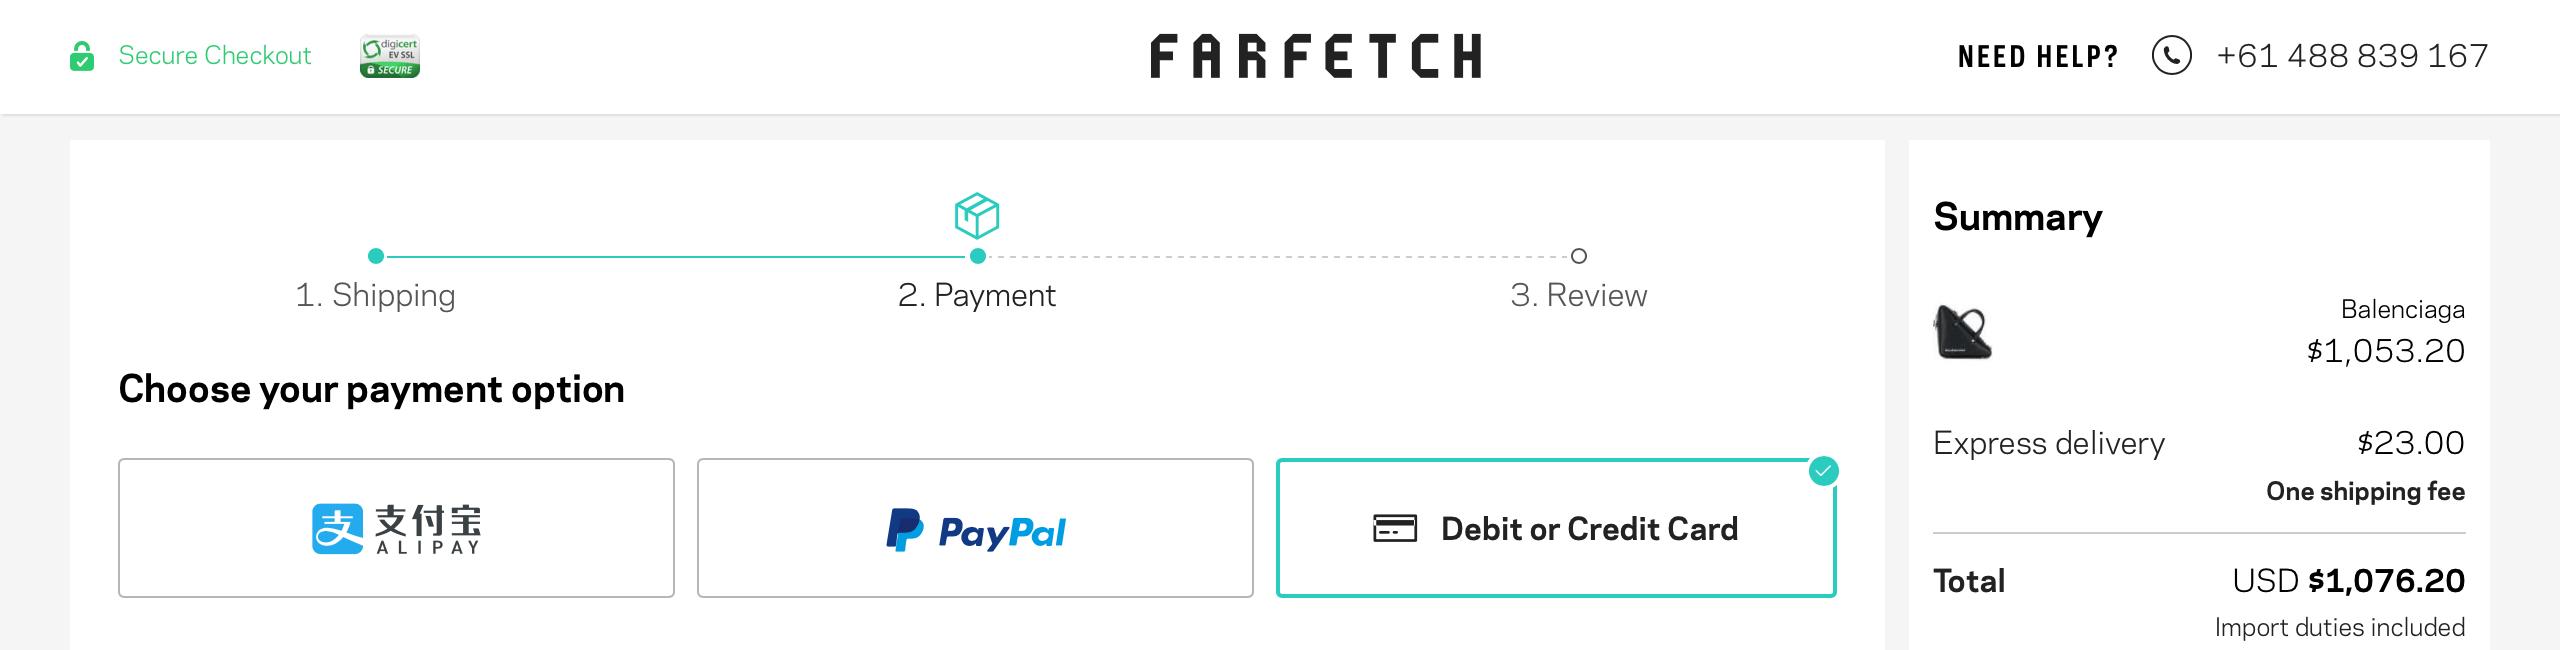 2019 farfetch 網購教學結帳